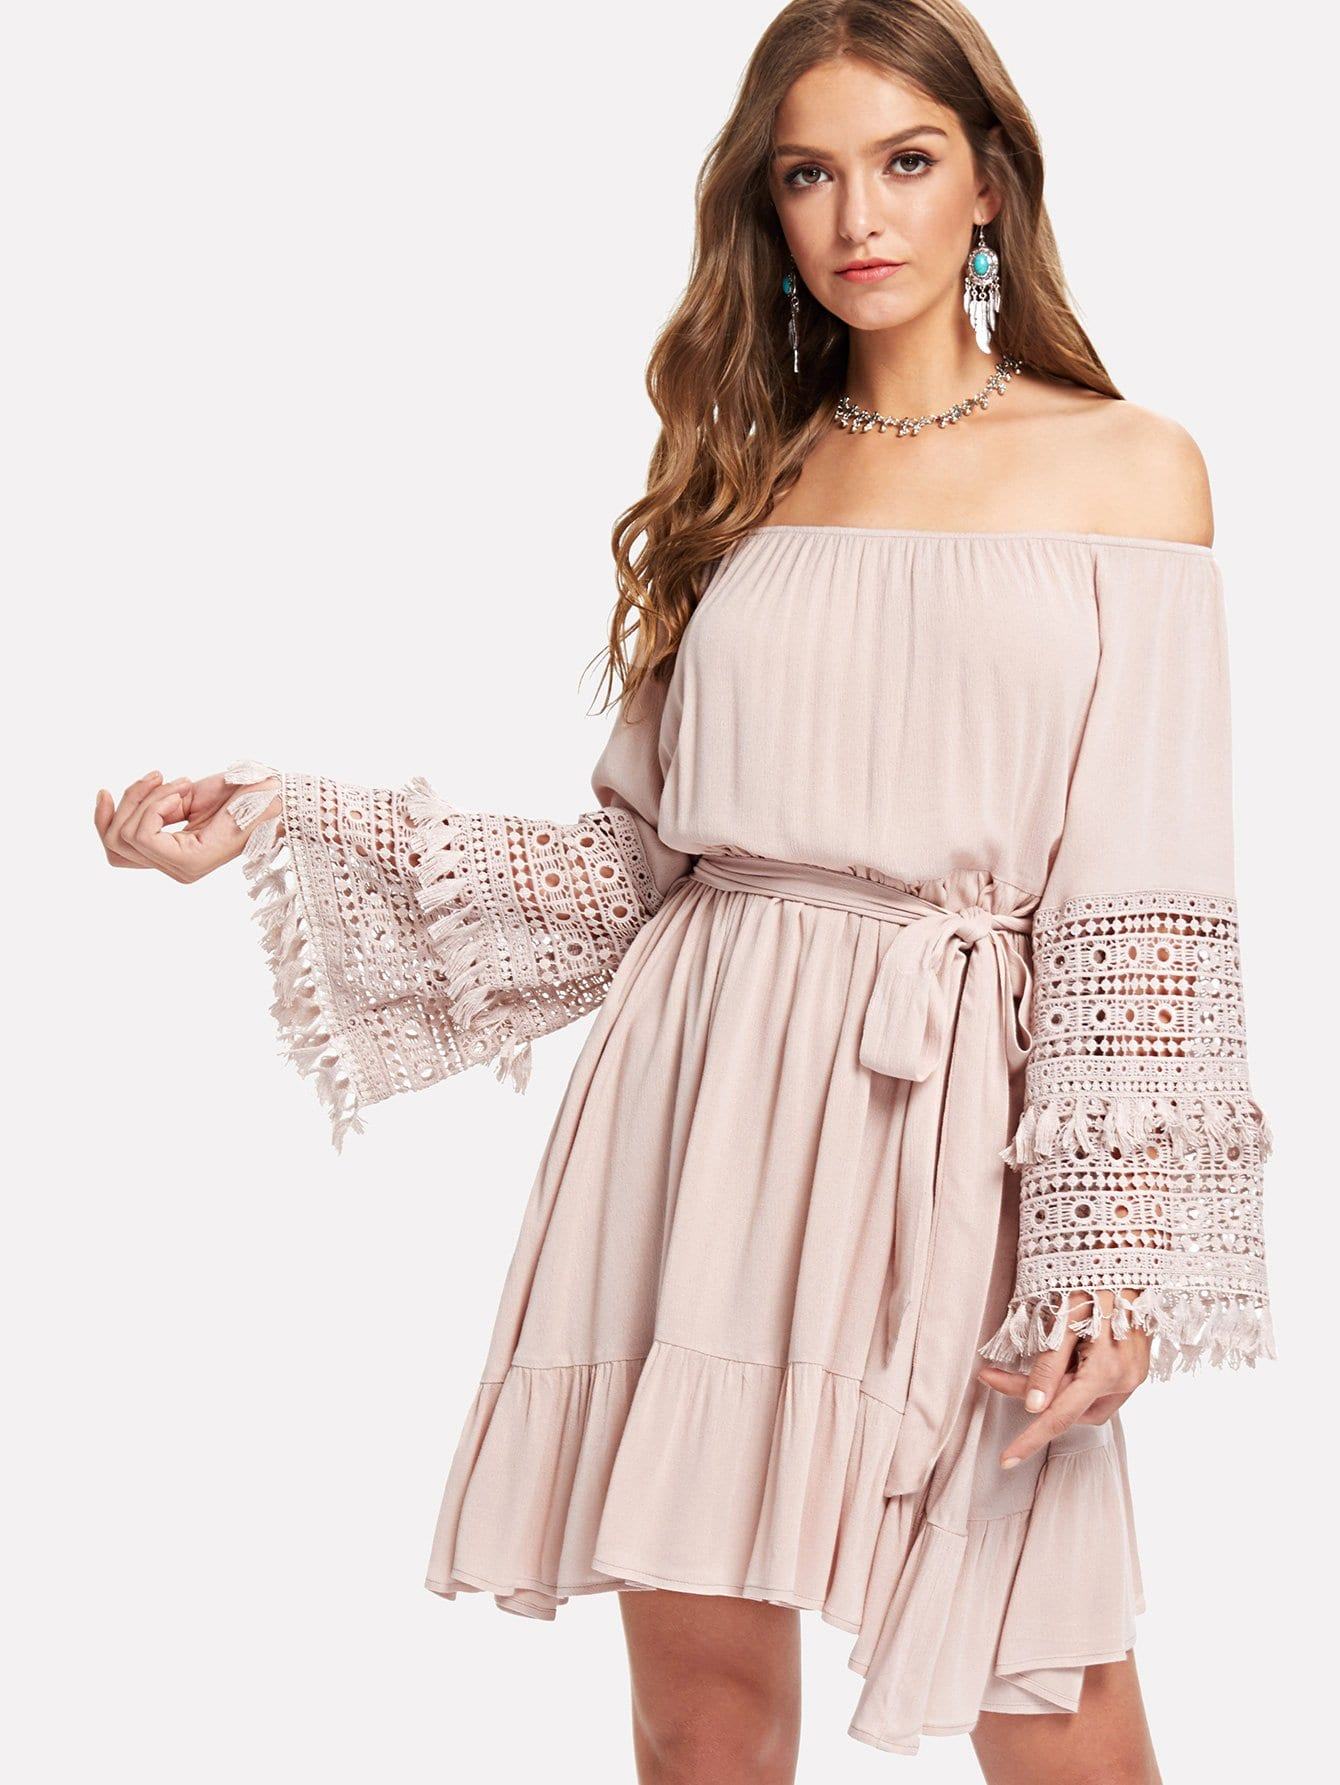 Tassel Detail Eyelet Lace Bell Sleeve Belted Bardot Dress scallop detail bell sleeve dress